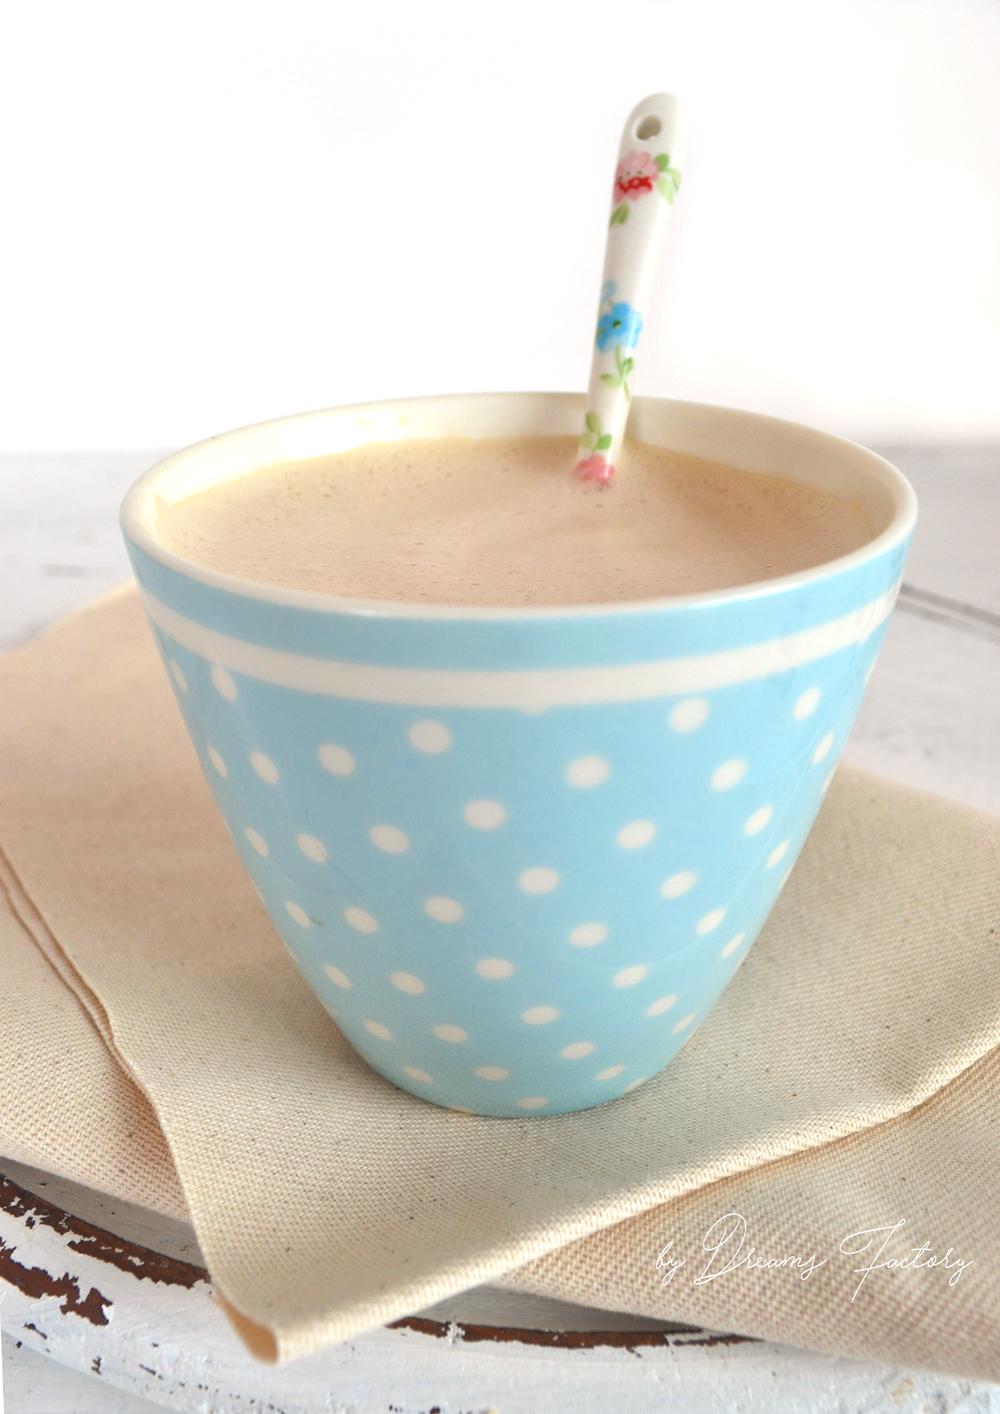 Creamy and foamy coconut oil coffee